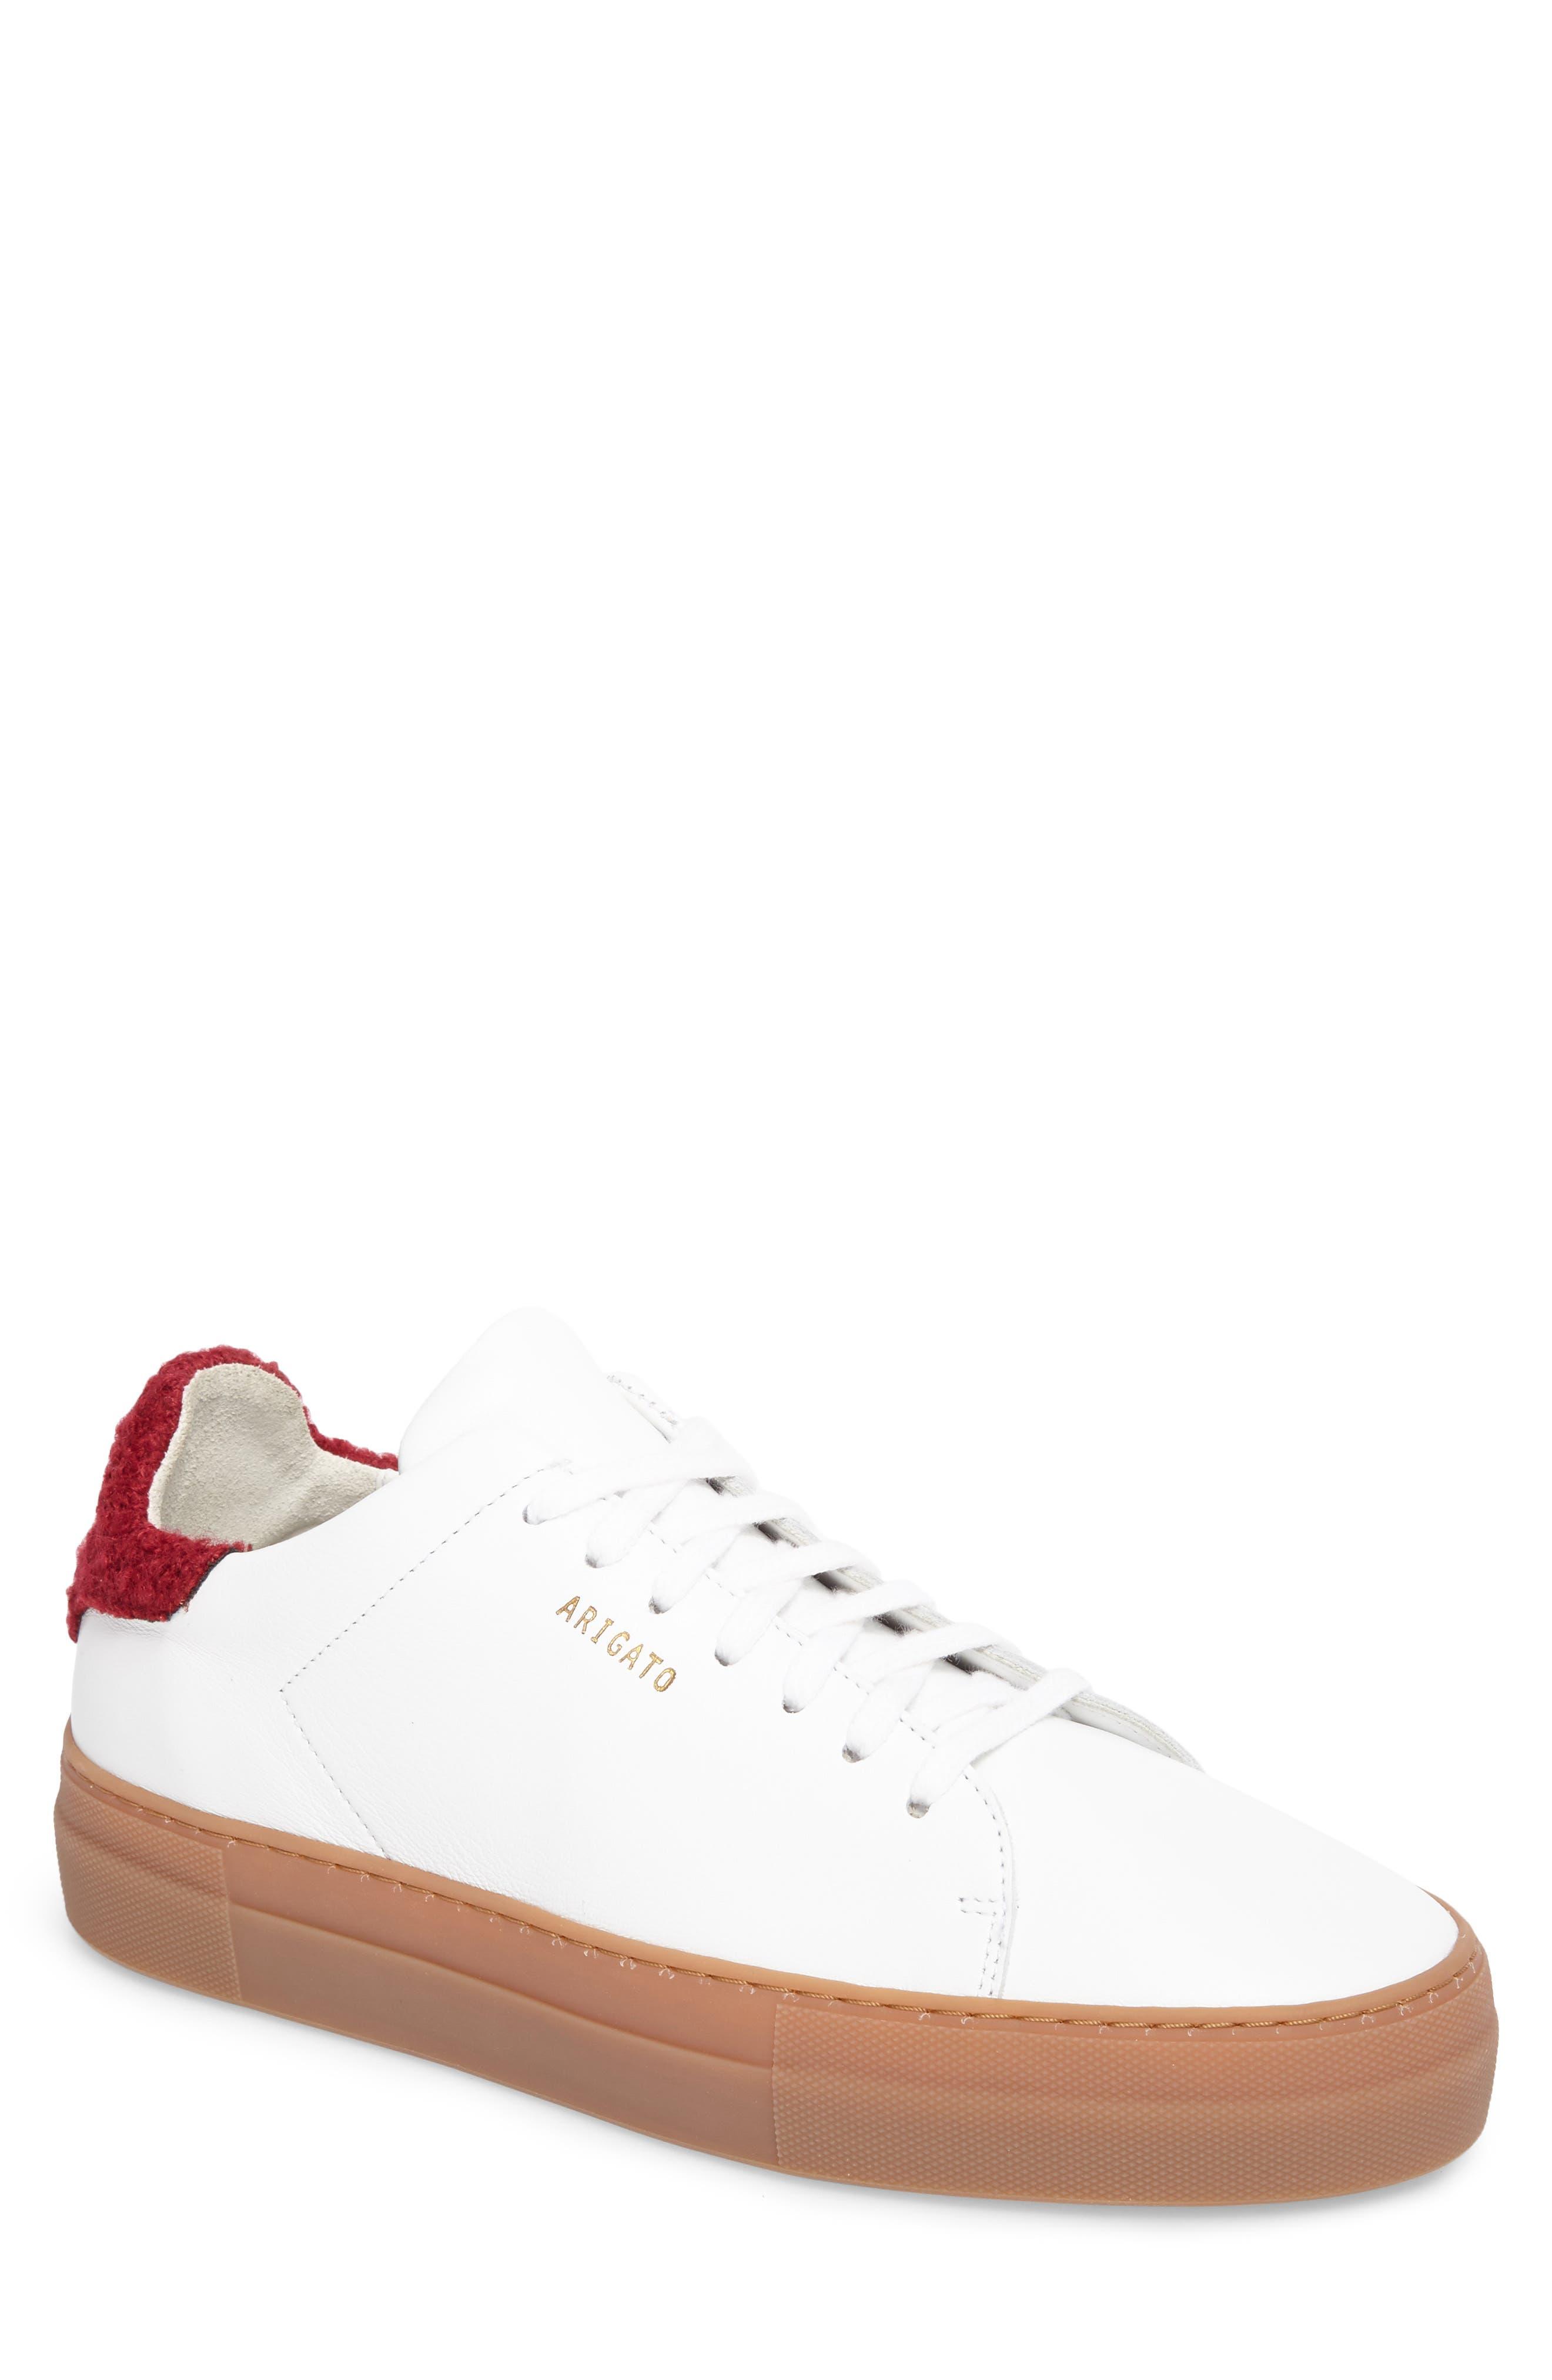 Clean 360 Fuzzy Heel Sneaker,                         Main,                         color, 100